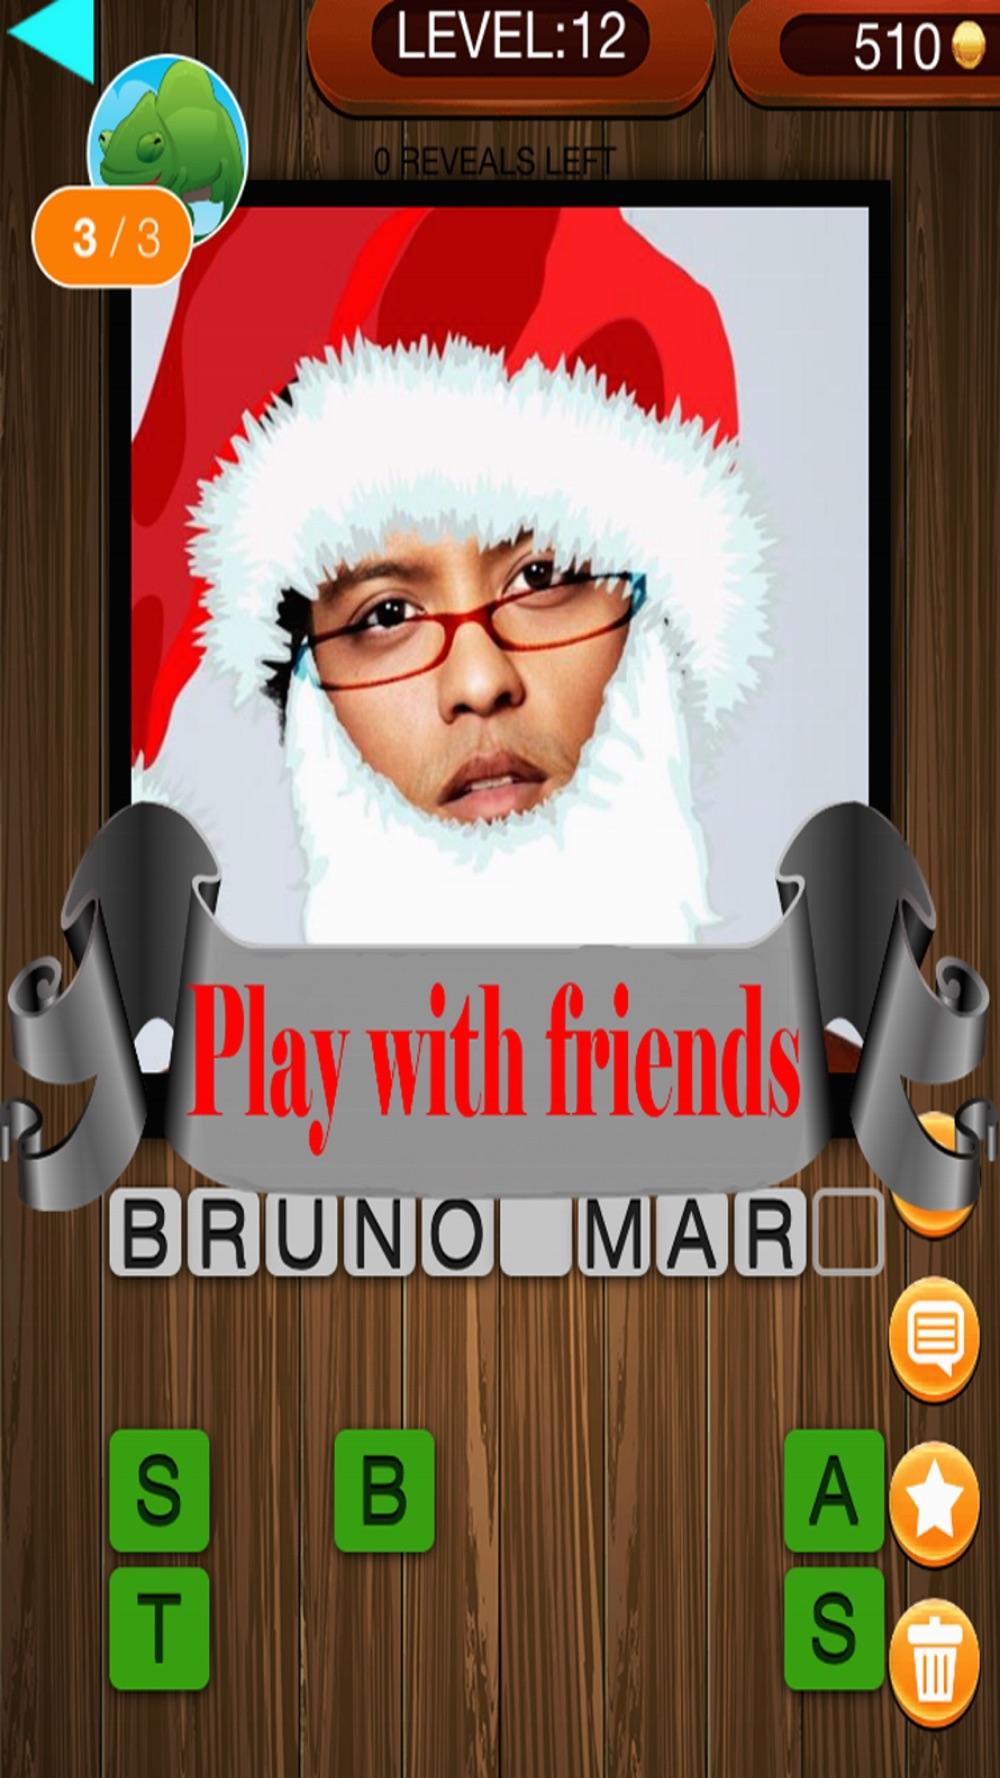 Christmas Factor Celebrity Santa Guess Who Pics Trivia Quiz - The Free App hack tool